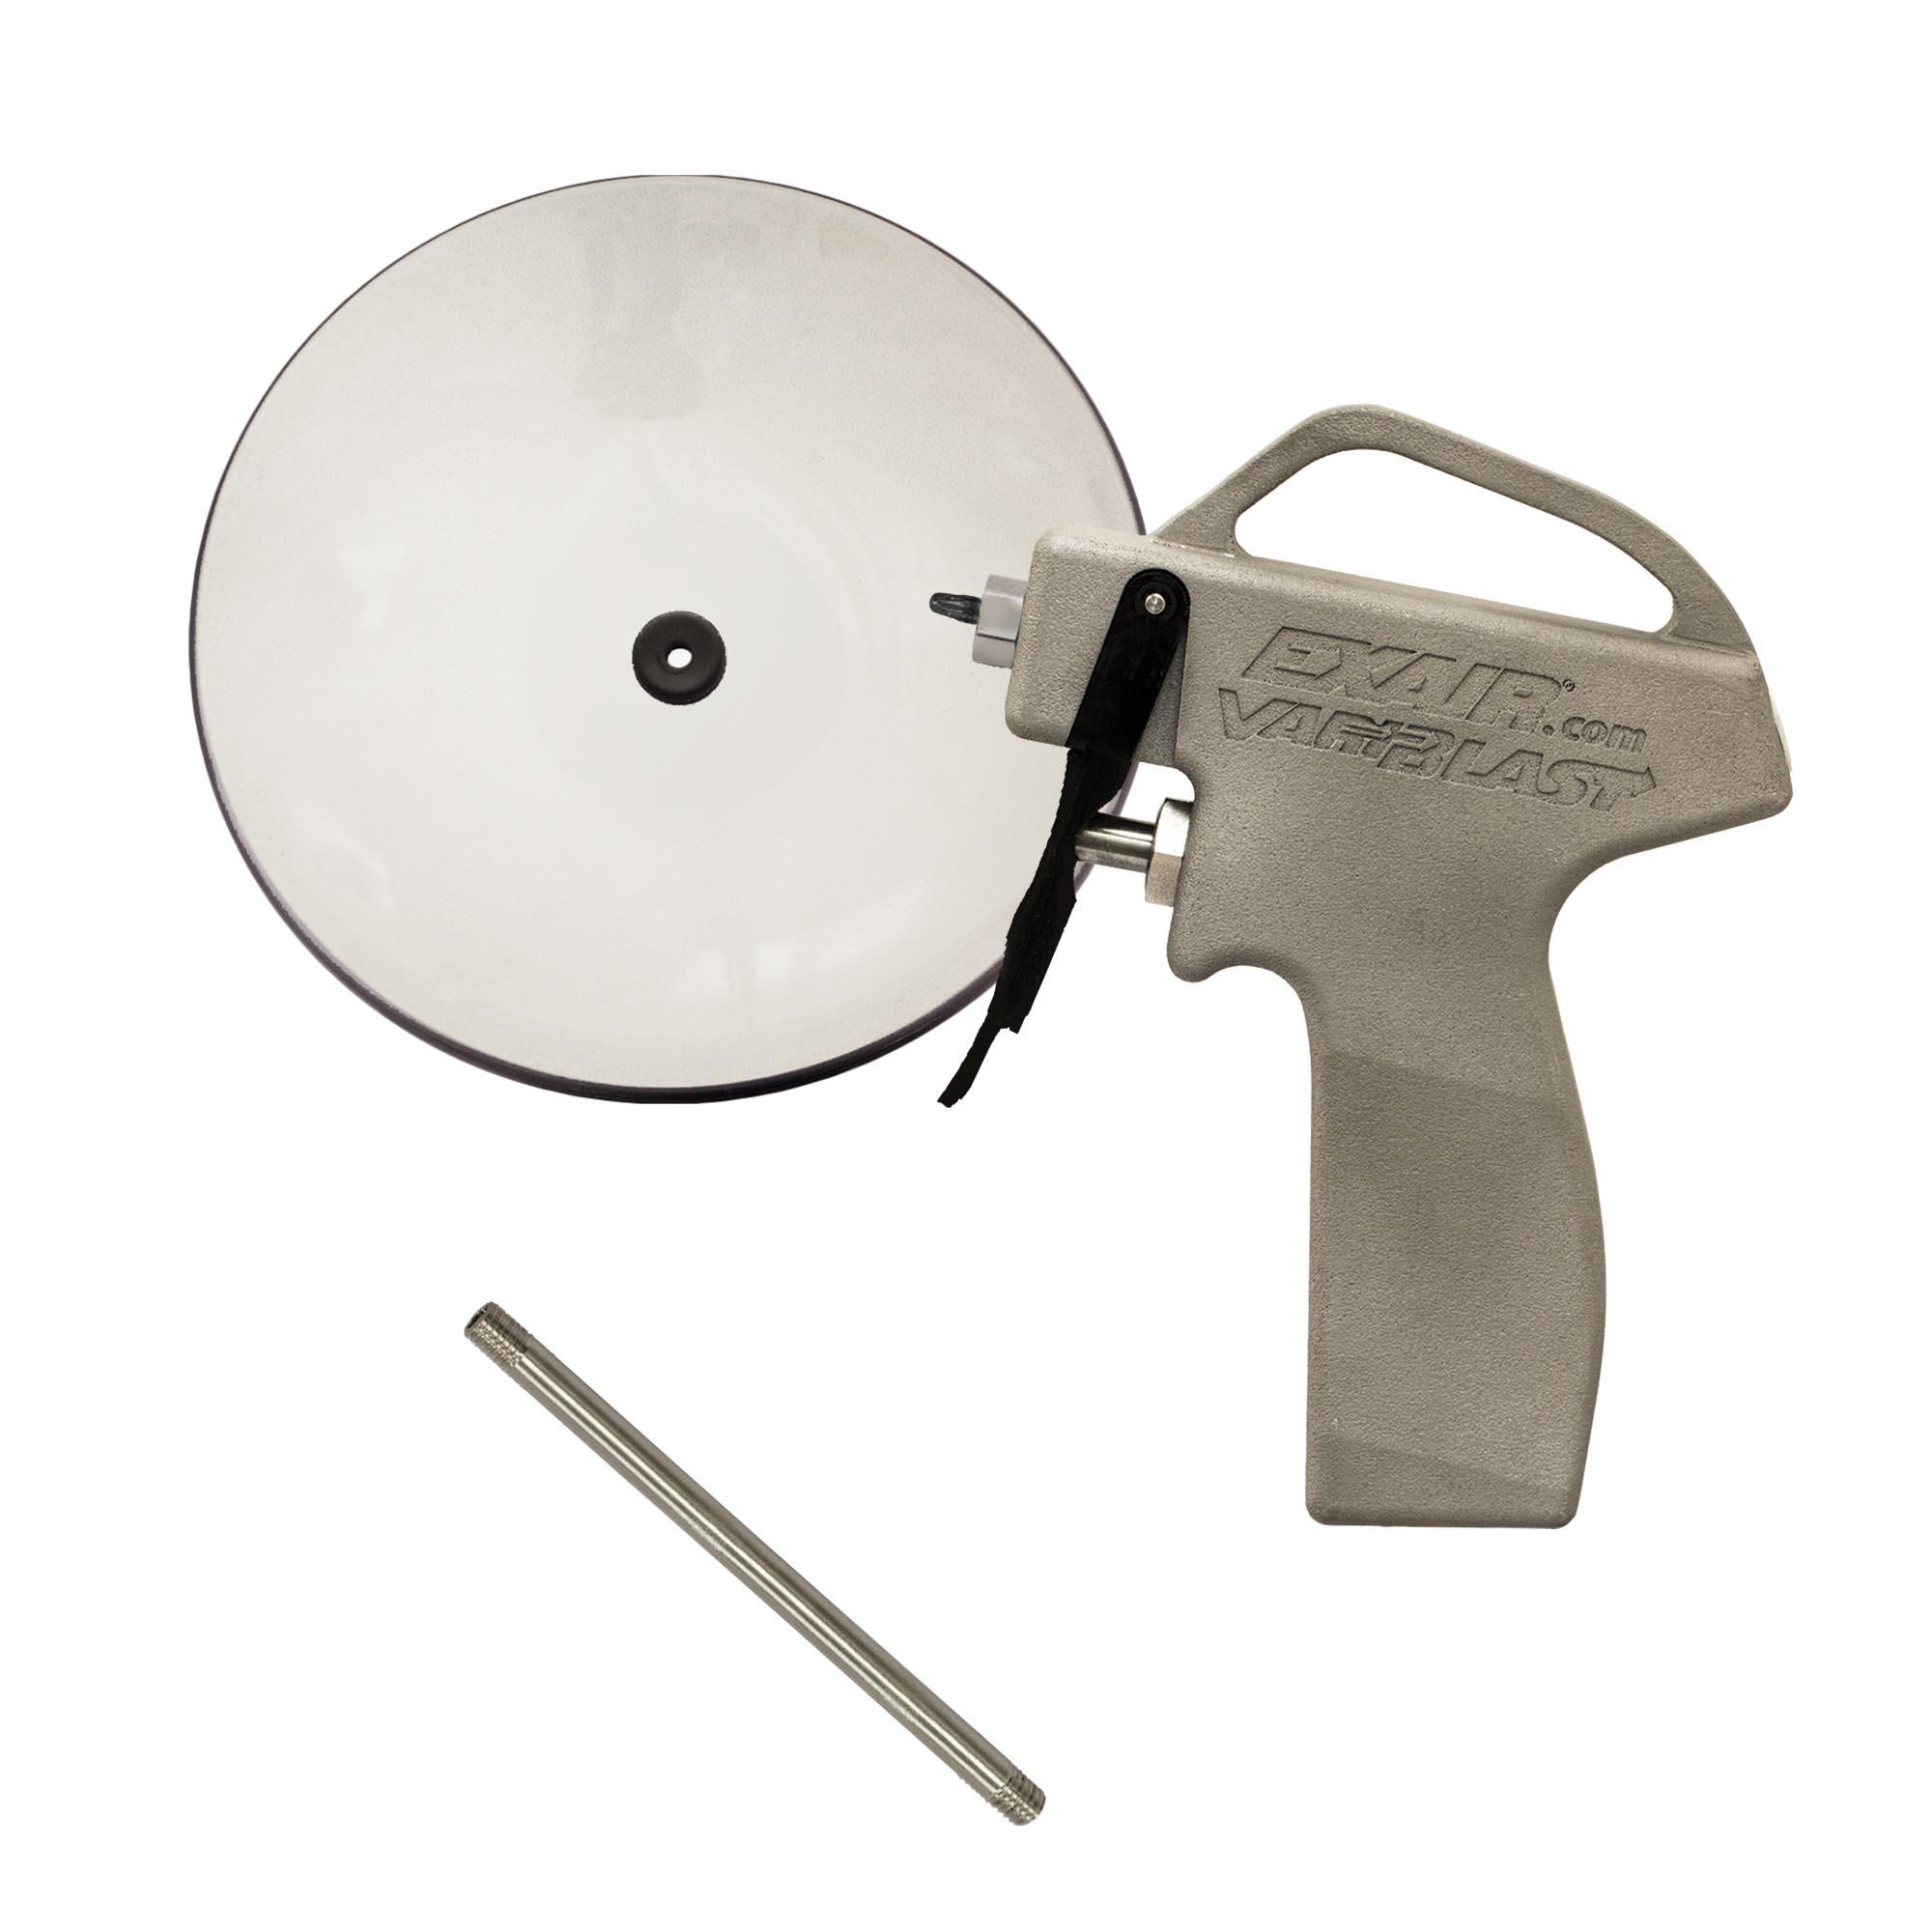 "Model 1696-PEEK-12-CS  12"" Variblast Compact Safety Air Gun with Chip Shield"